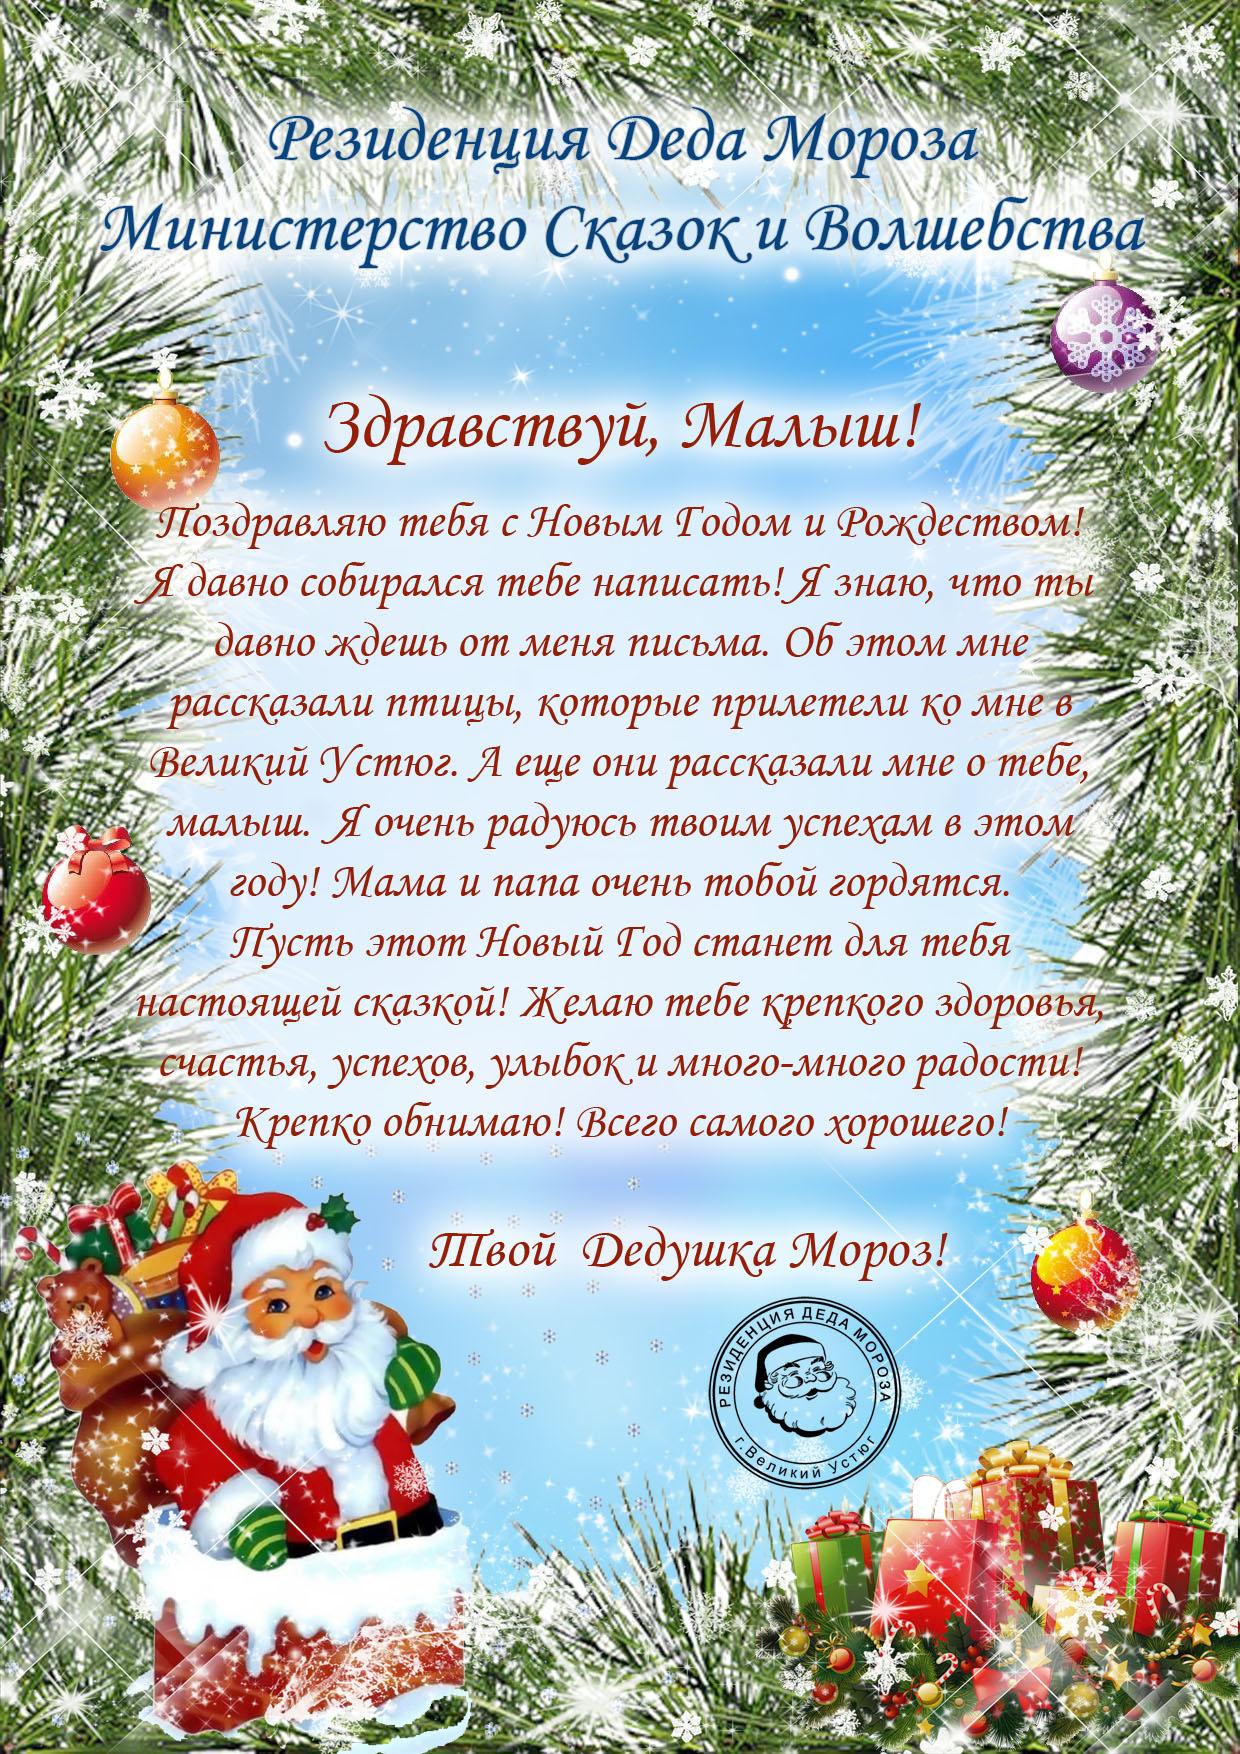 Письмо От Деда Мороза Торрент